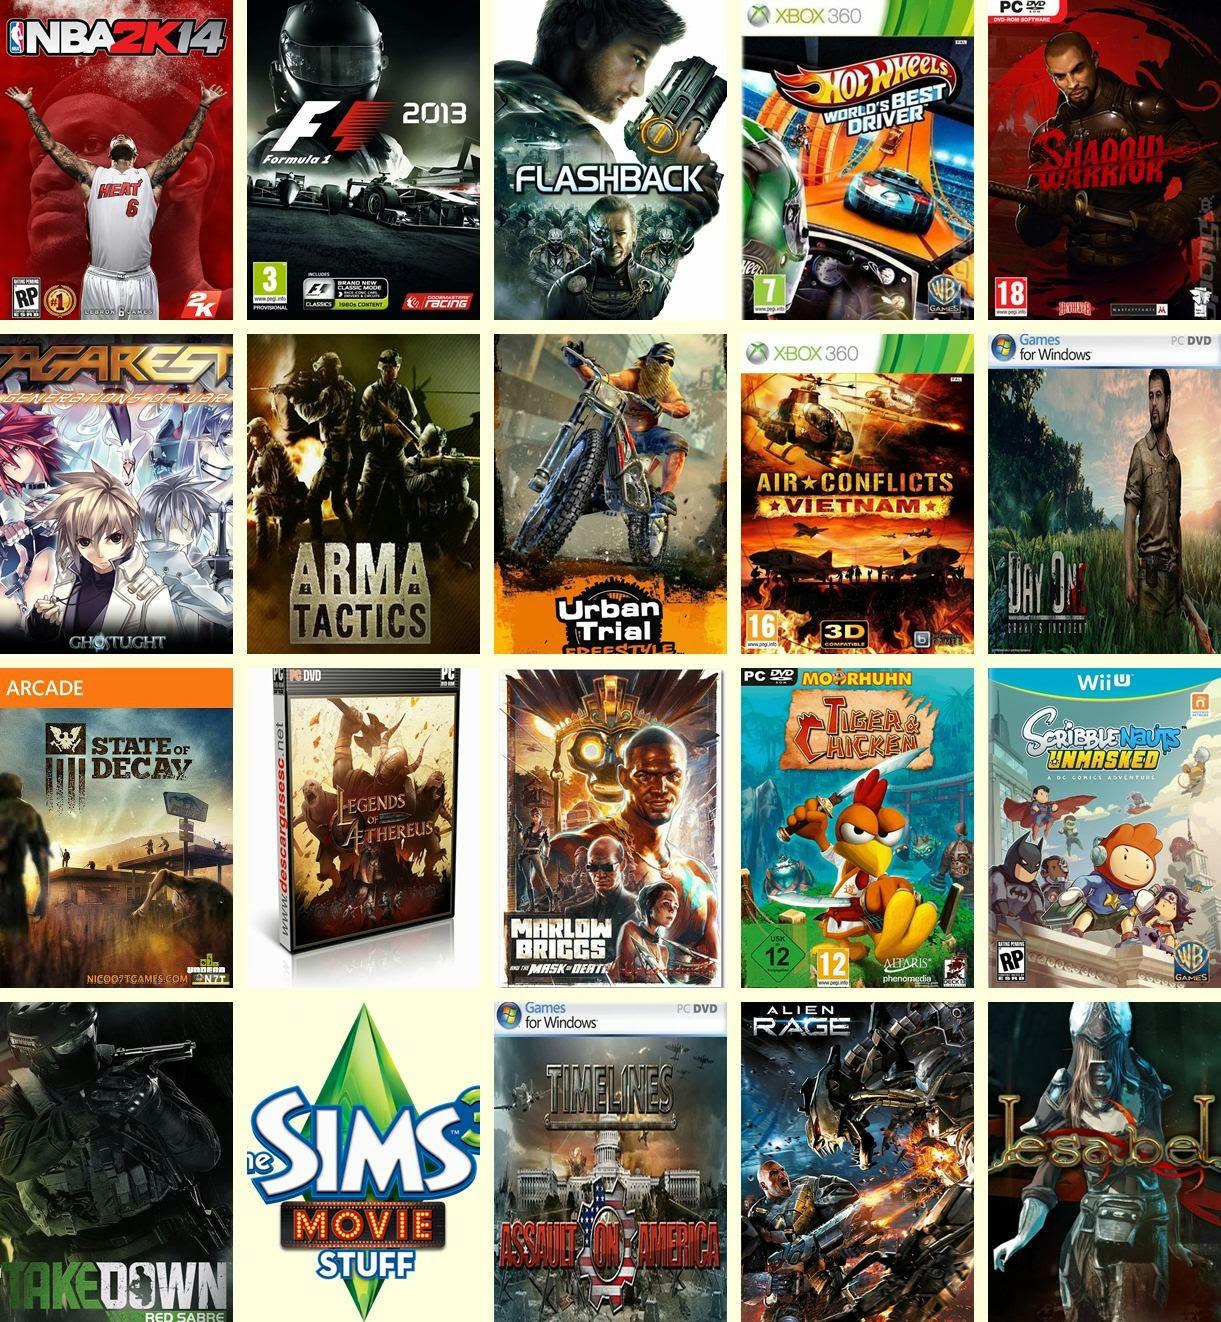 Greek games on GameSheep.com